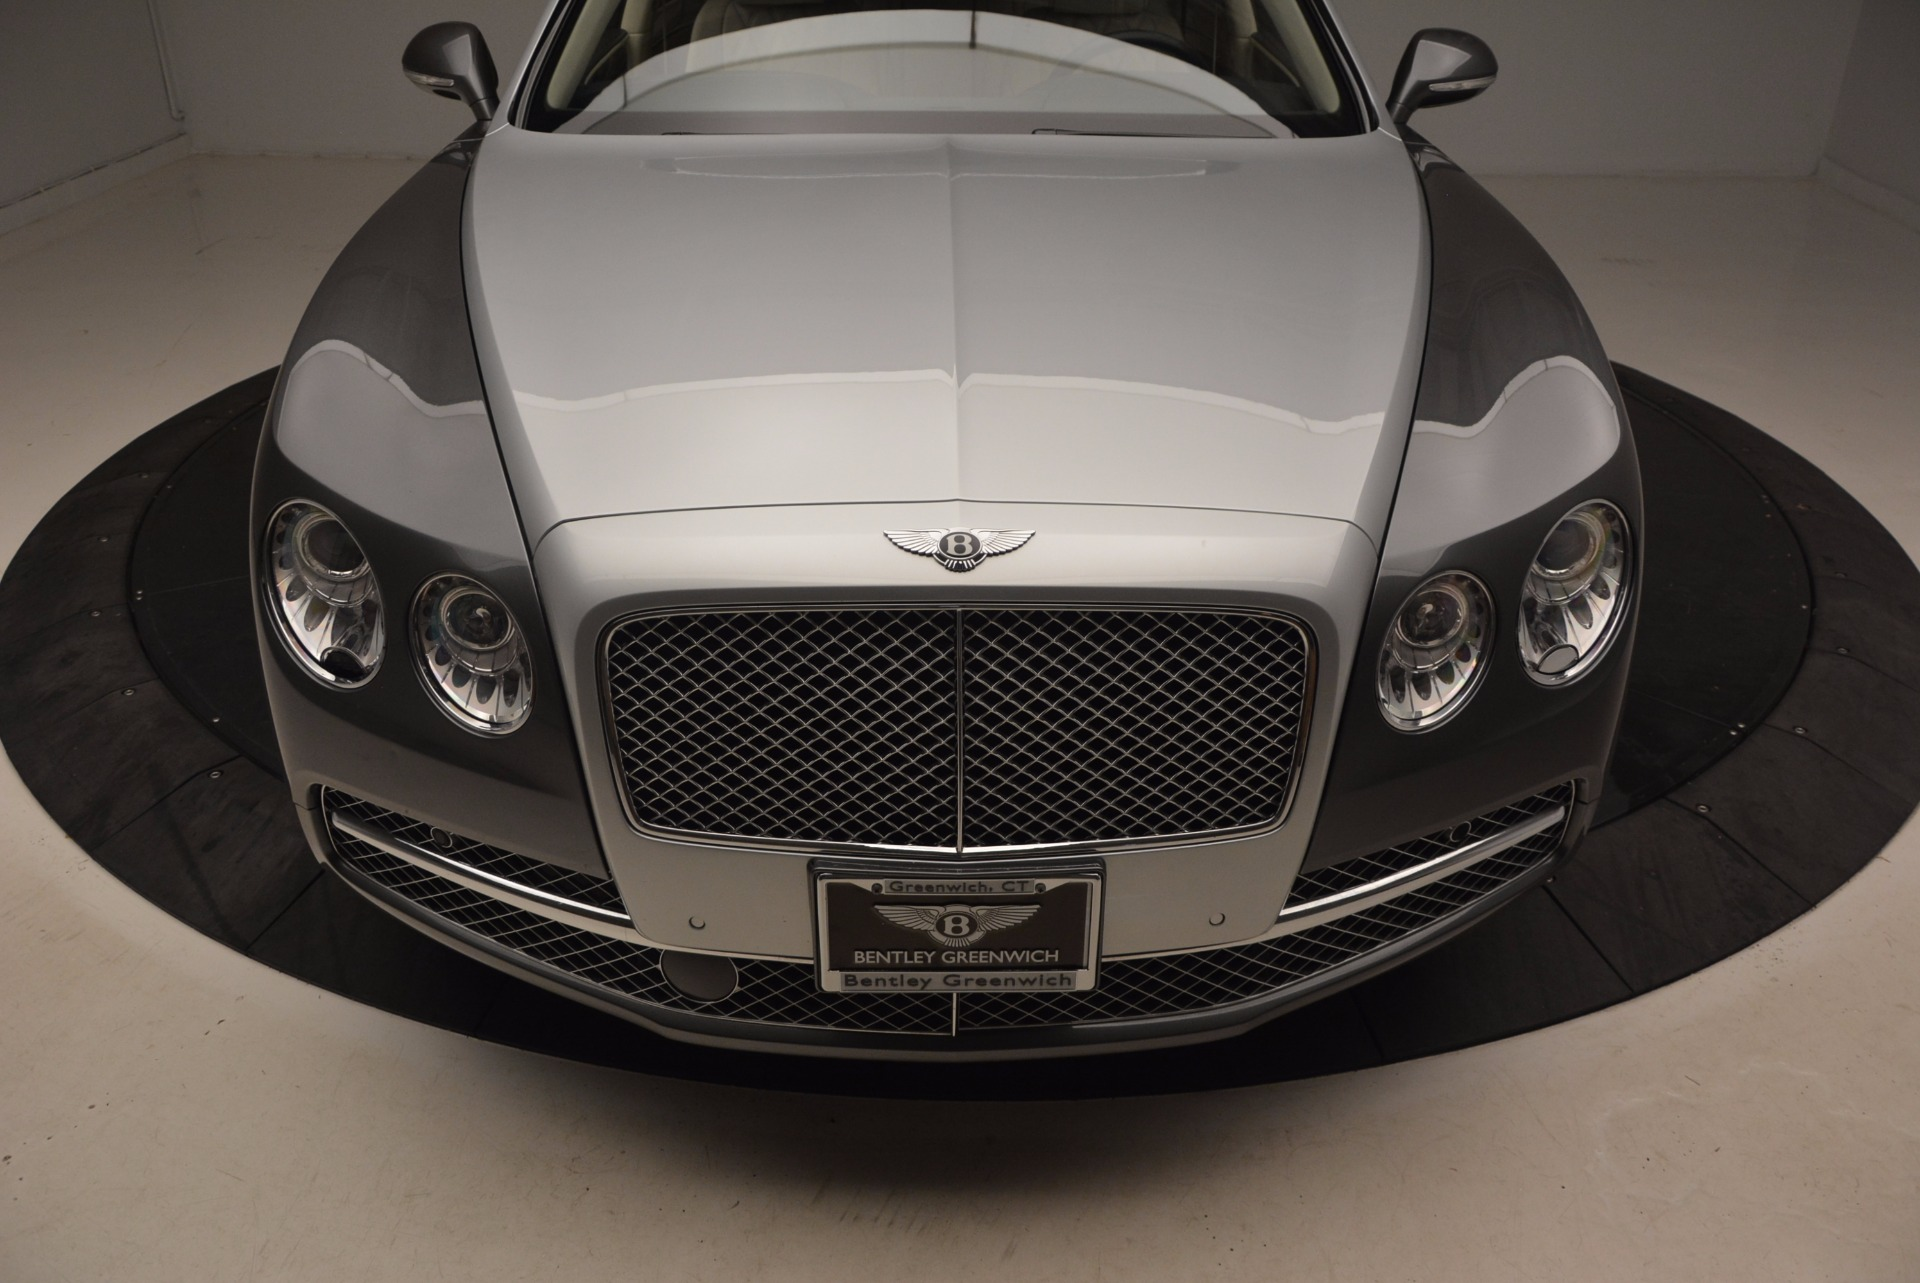 Used 2015 Bentley Flying Spur W12 For Sale In Westport, CT 1582_p13